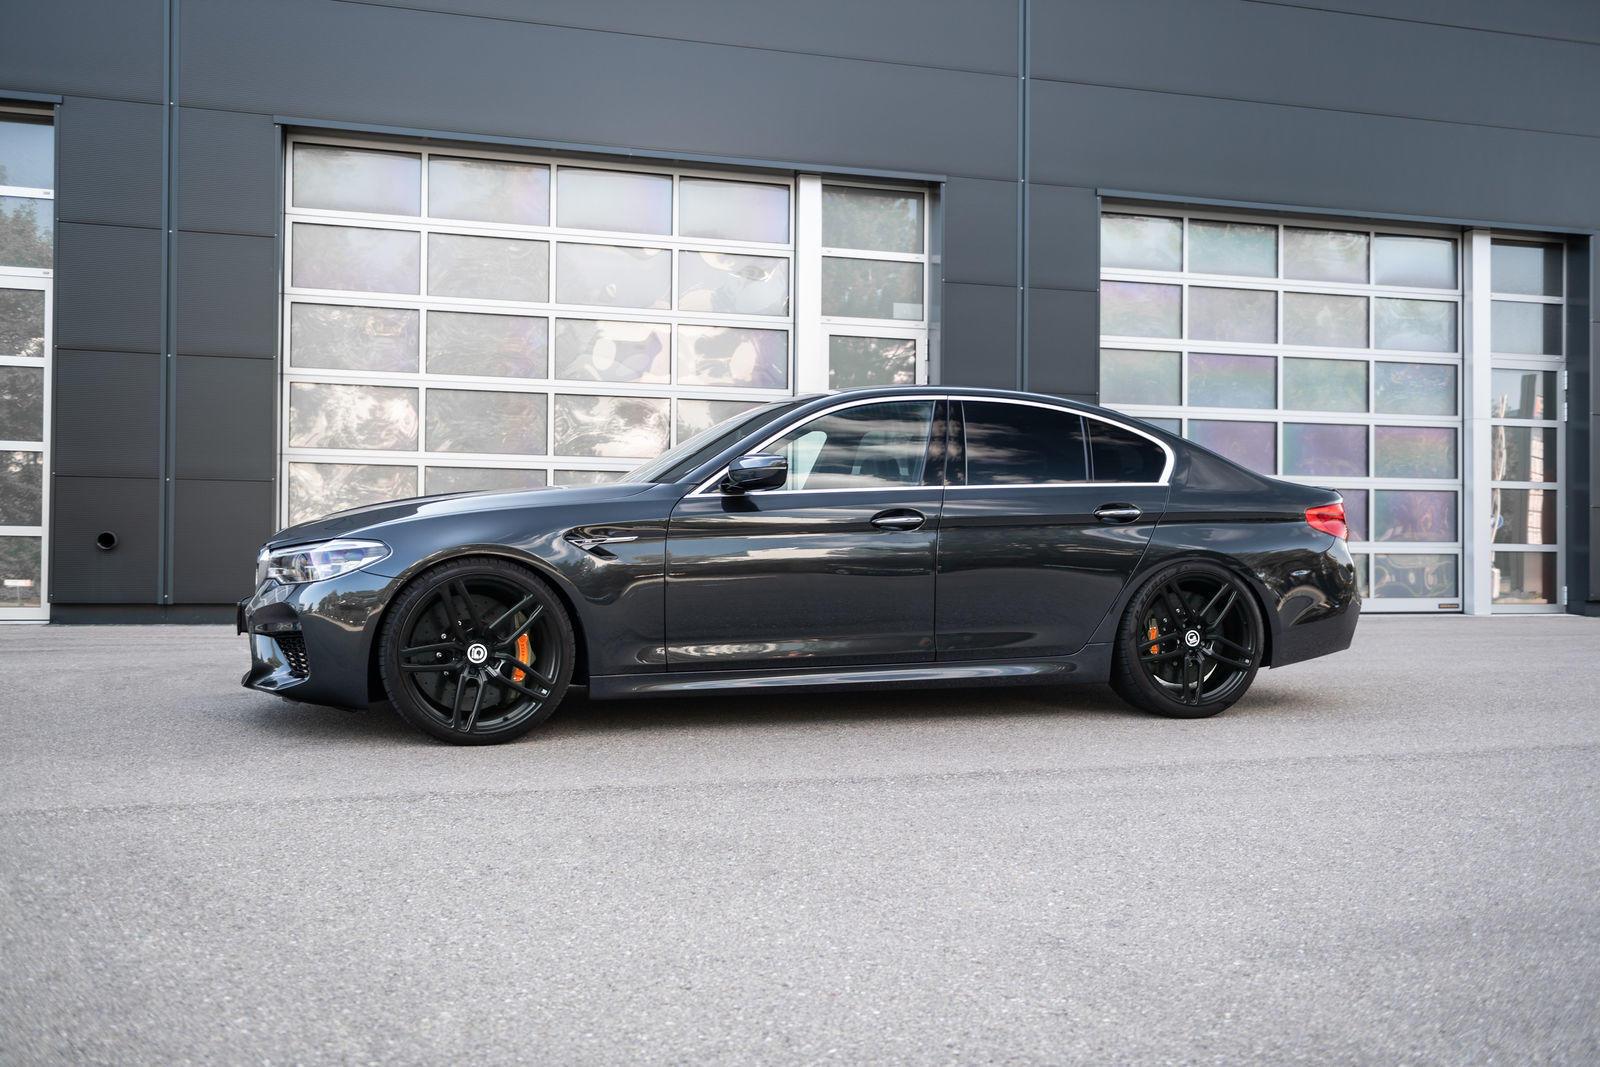 BMW M5 F90 de la G-Power - BMW M5 F90 de la G-Power